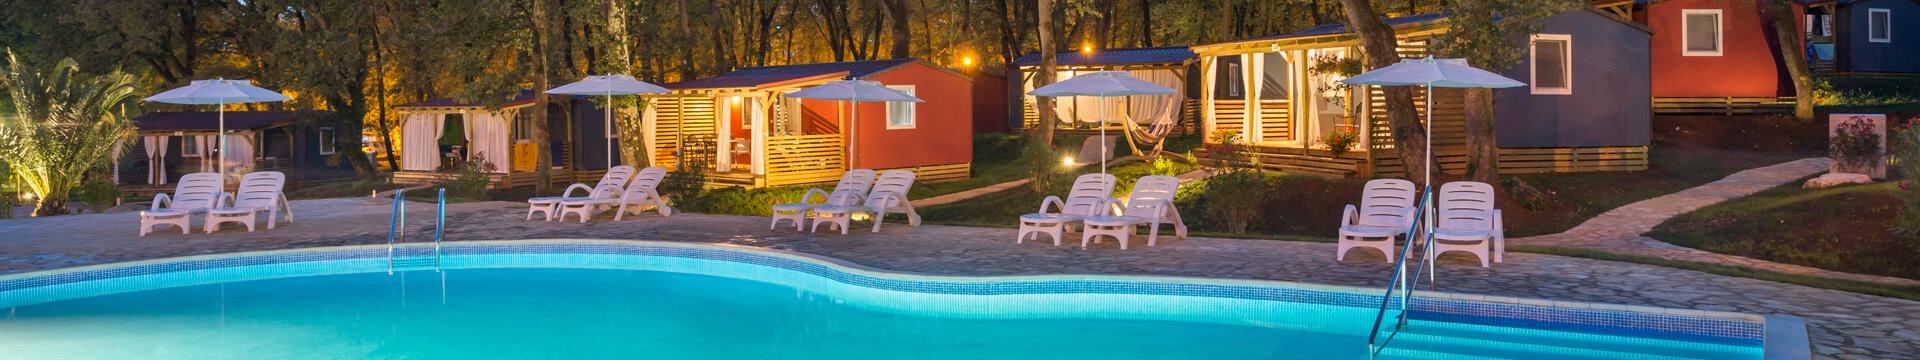 Partner kamp Aminess Park Mareda Campsite****